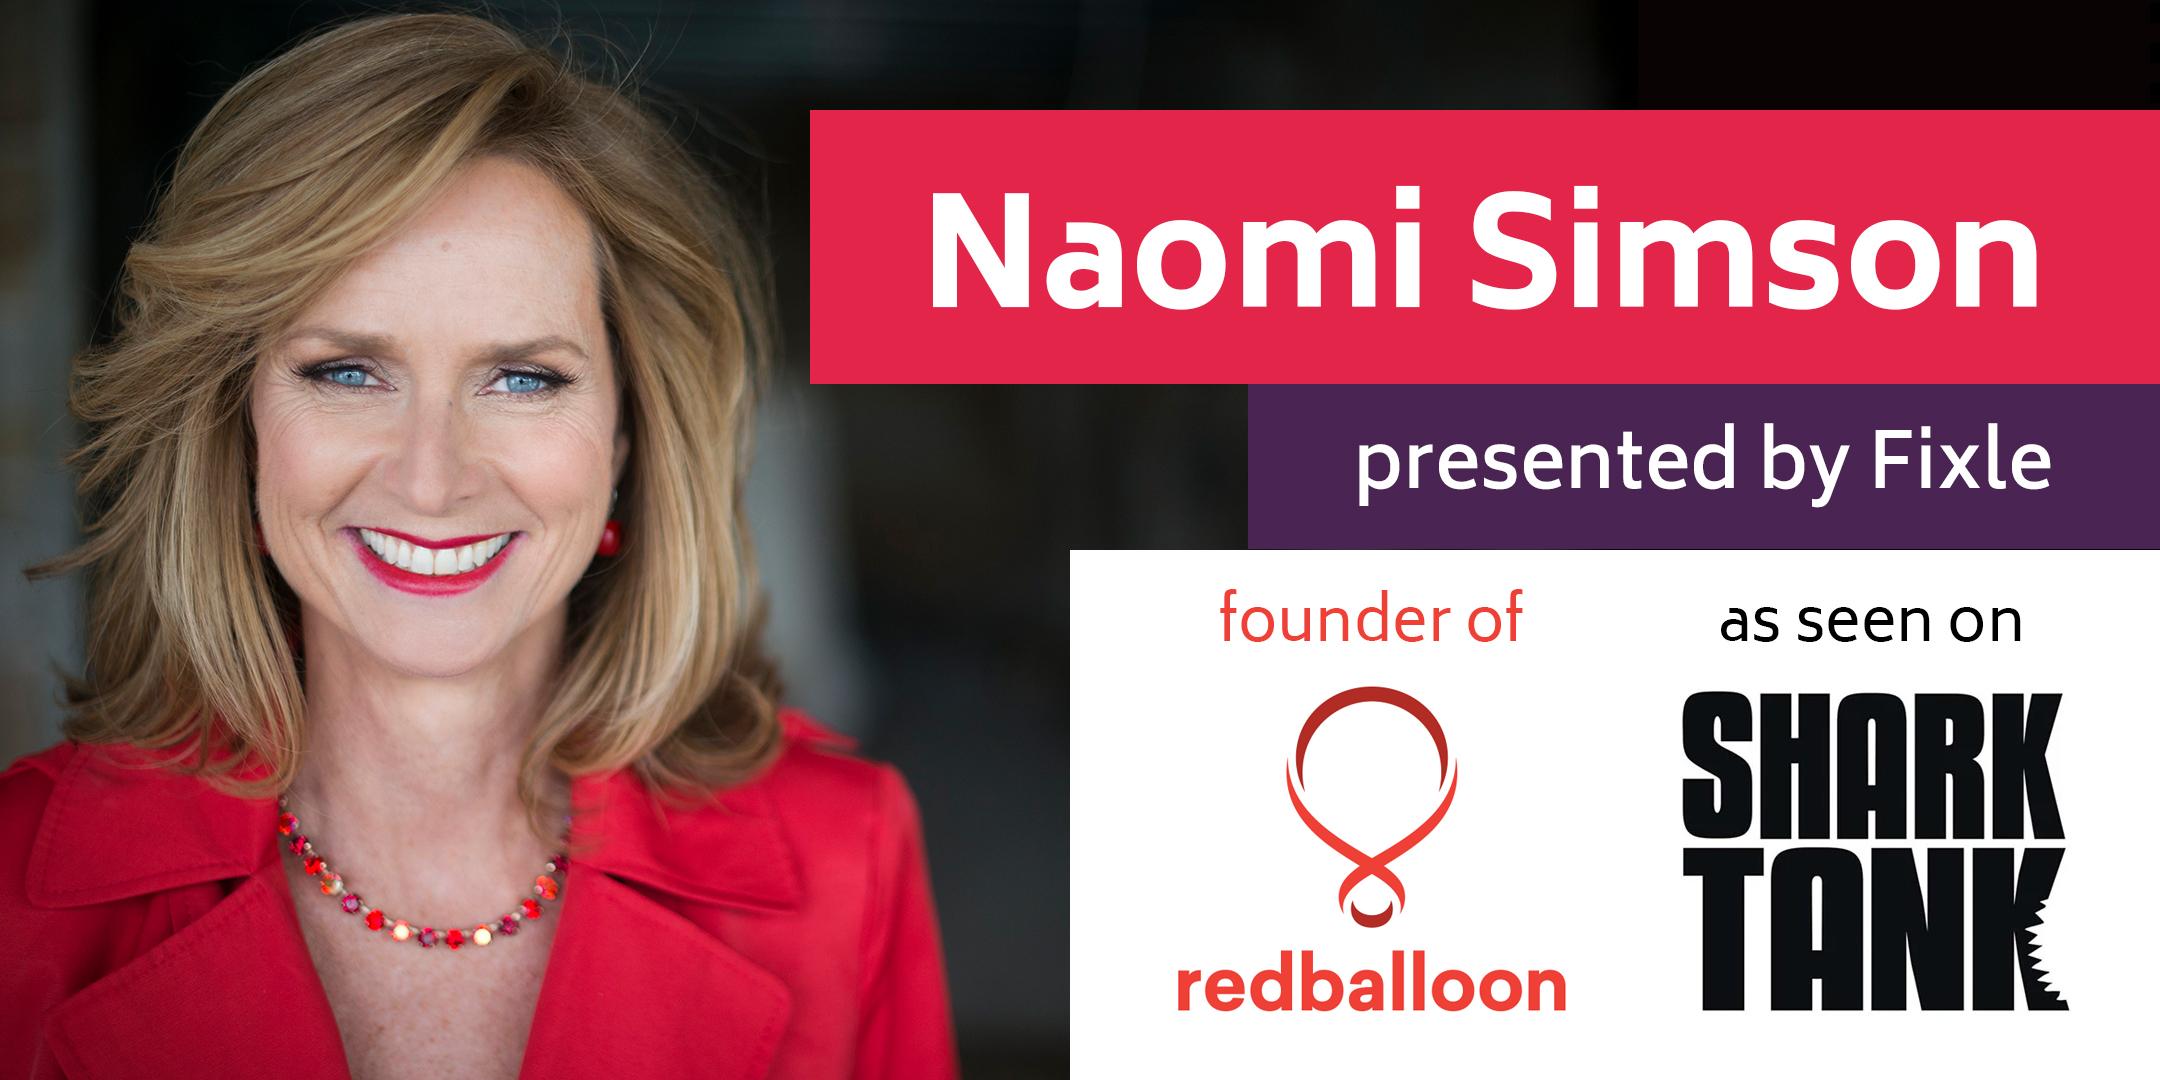 naomi-simson-eventbrite-banner.jpg